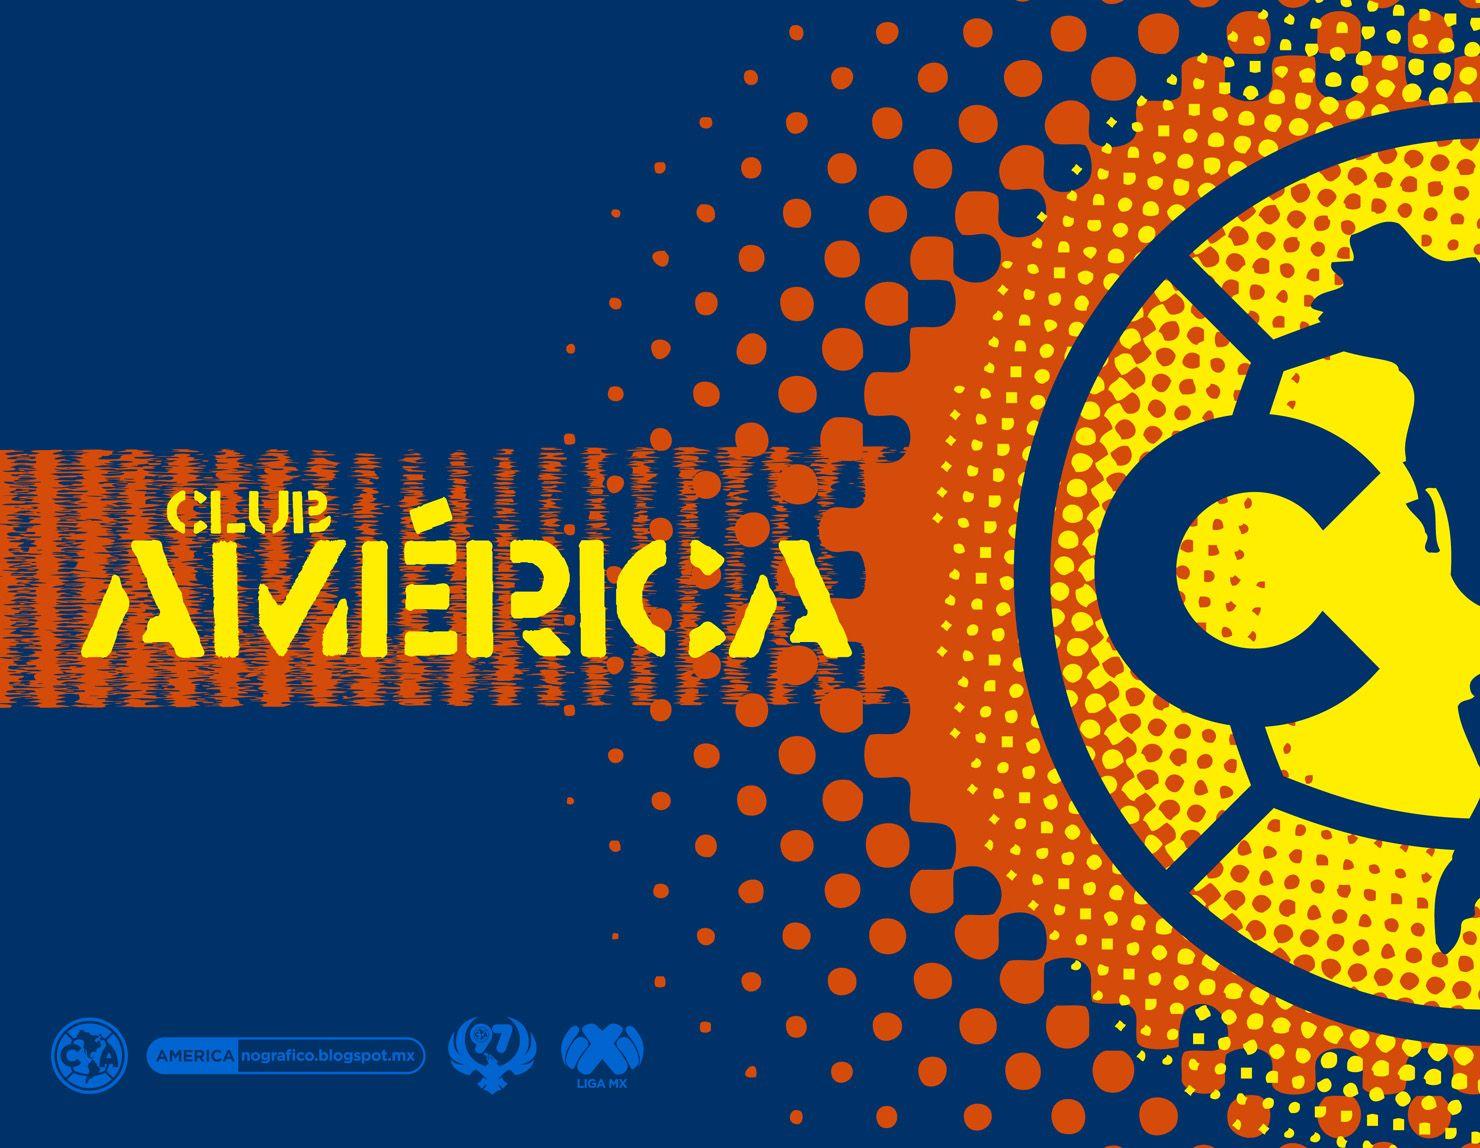 Wallpaper 10072013CTG2 • #ClubAmérica #AMERICAnografico